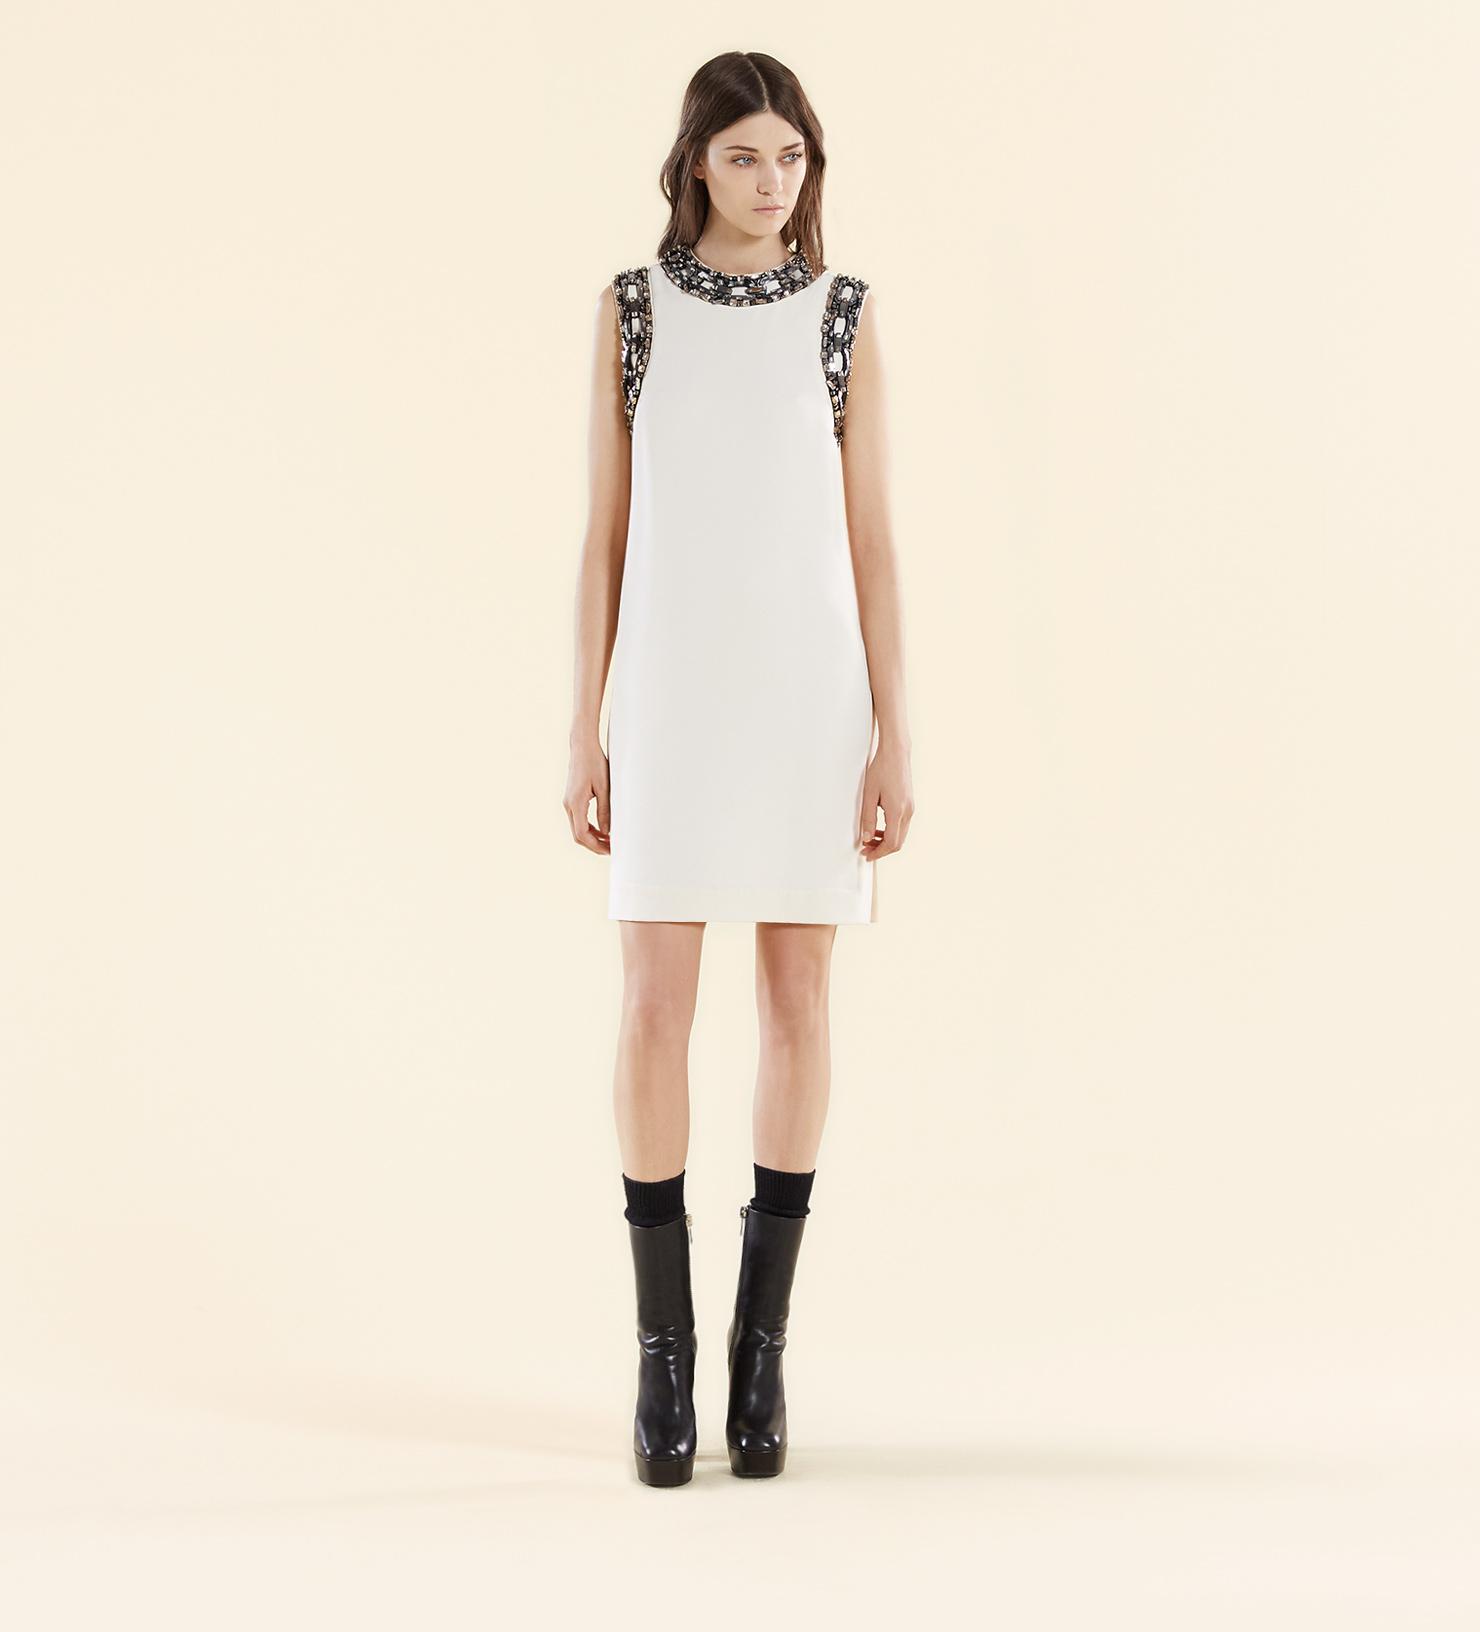 Gucci White Dress